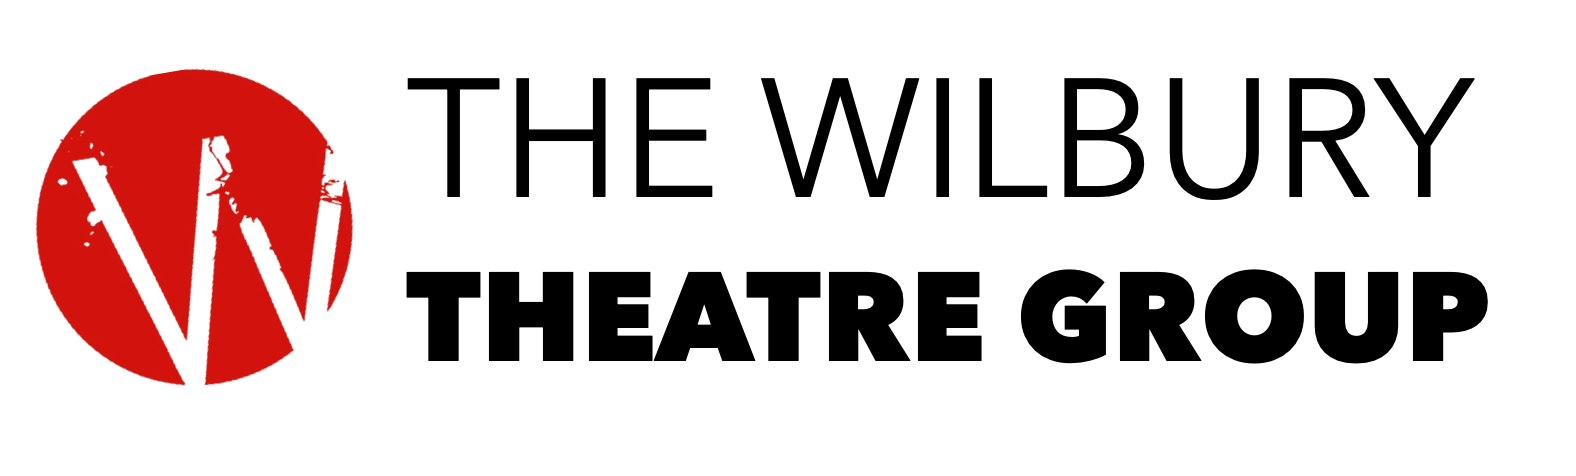 WTG-logo w black text no background - Josh Short.png